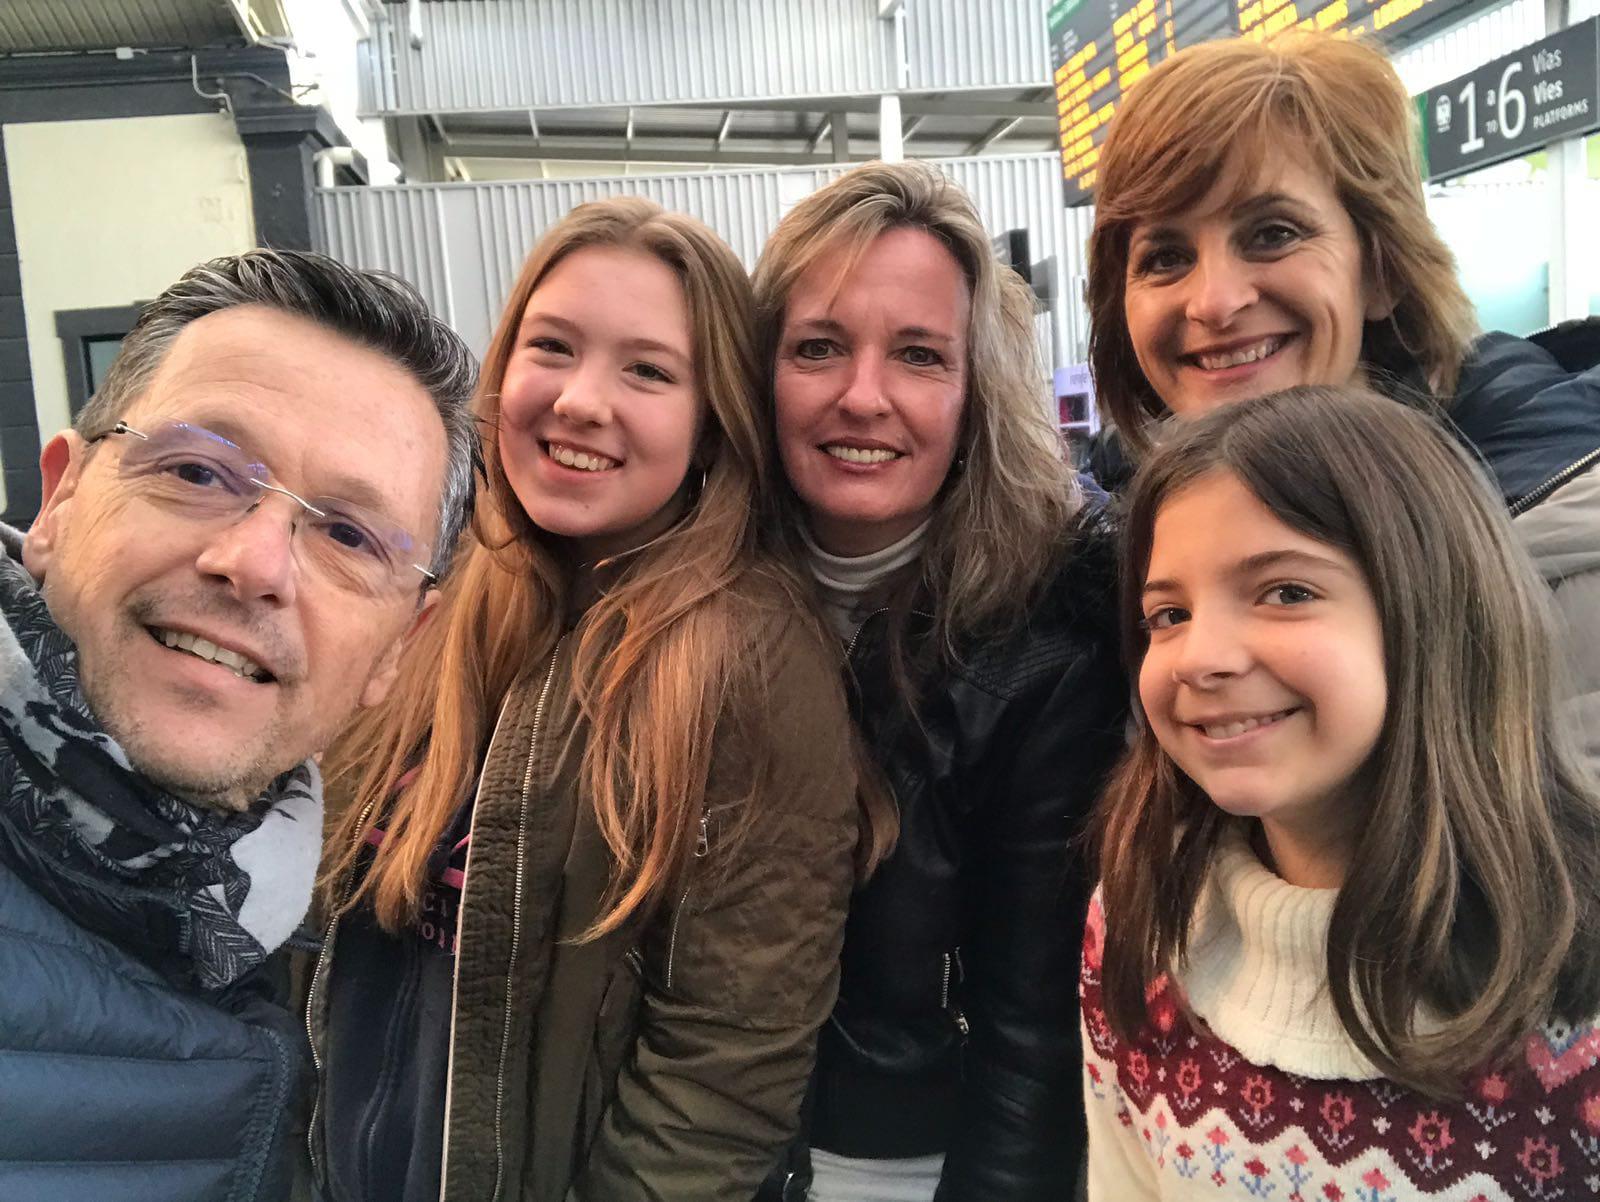 Abschiedsfoto Schüleraustausch Spanien